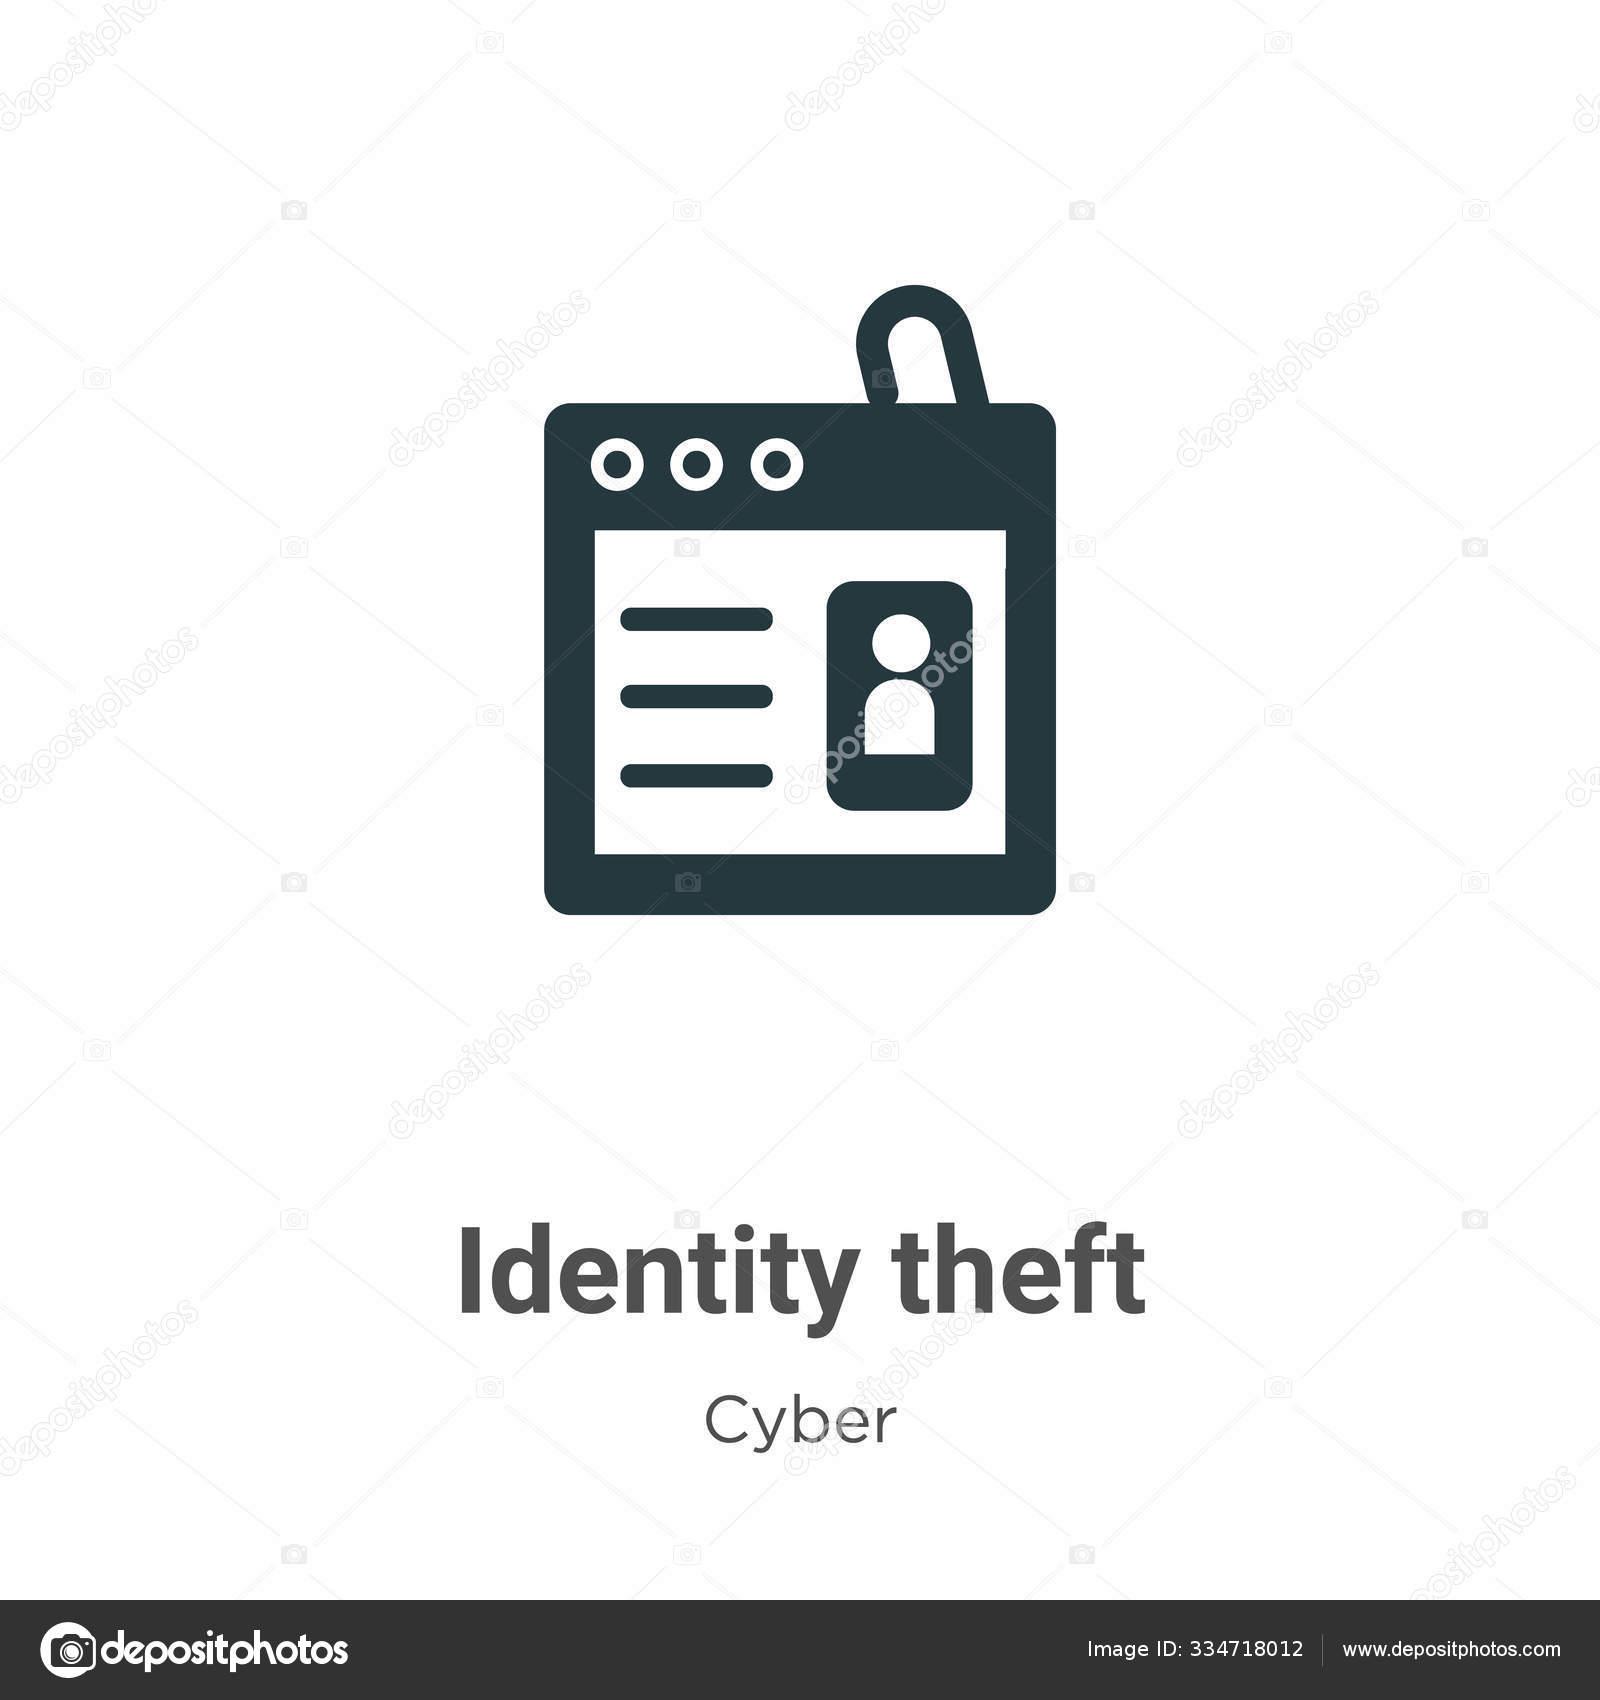 identity theft vector icon white background flat vector identity theft stock vector c digital bazaar 334718012 depositphotos